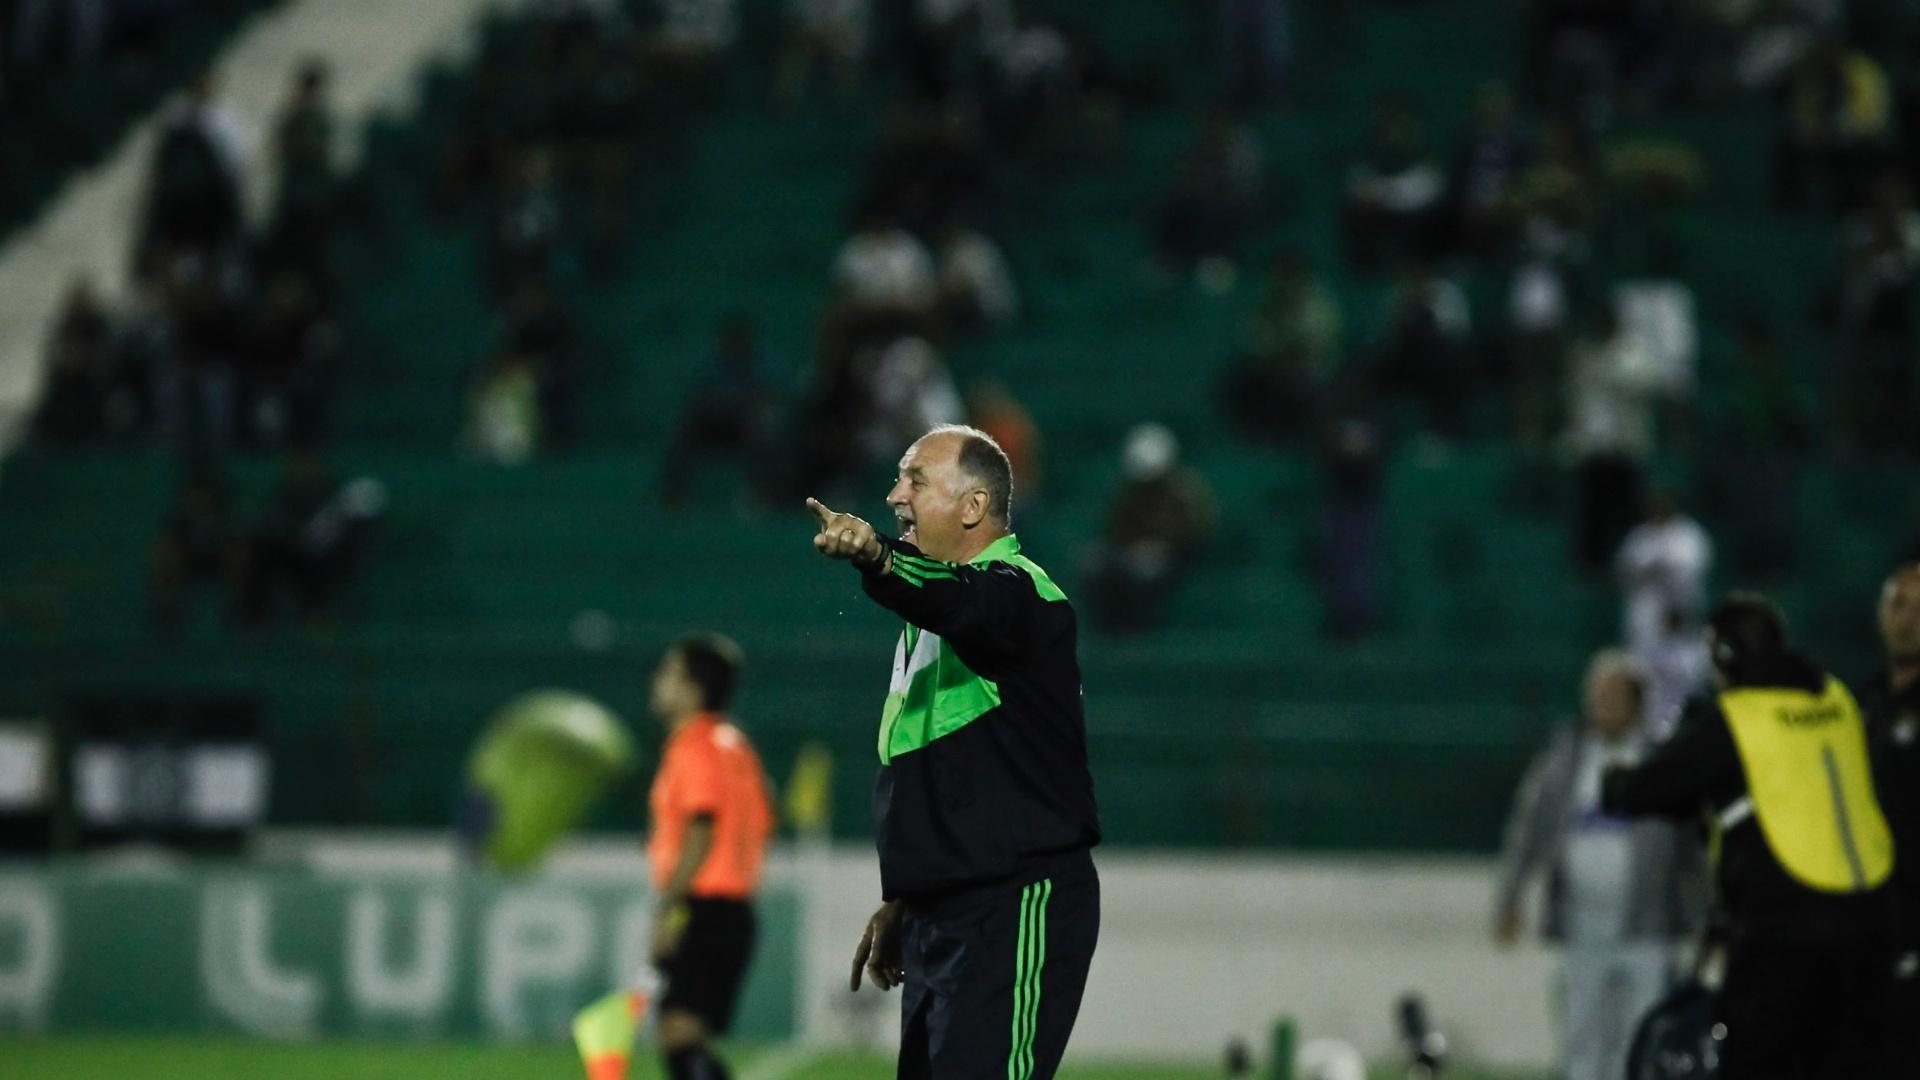 Felipão orienta o Palmeiras na lateral do campo